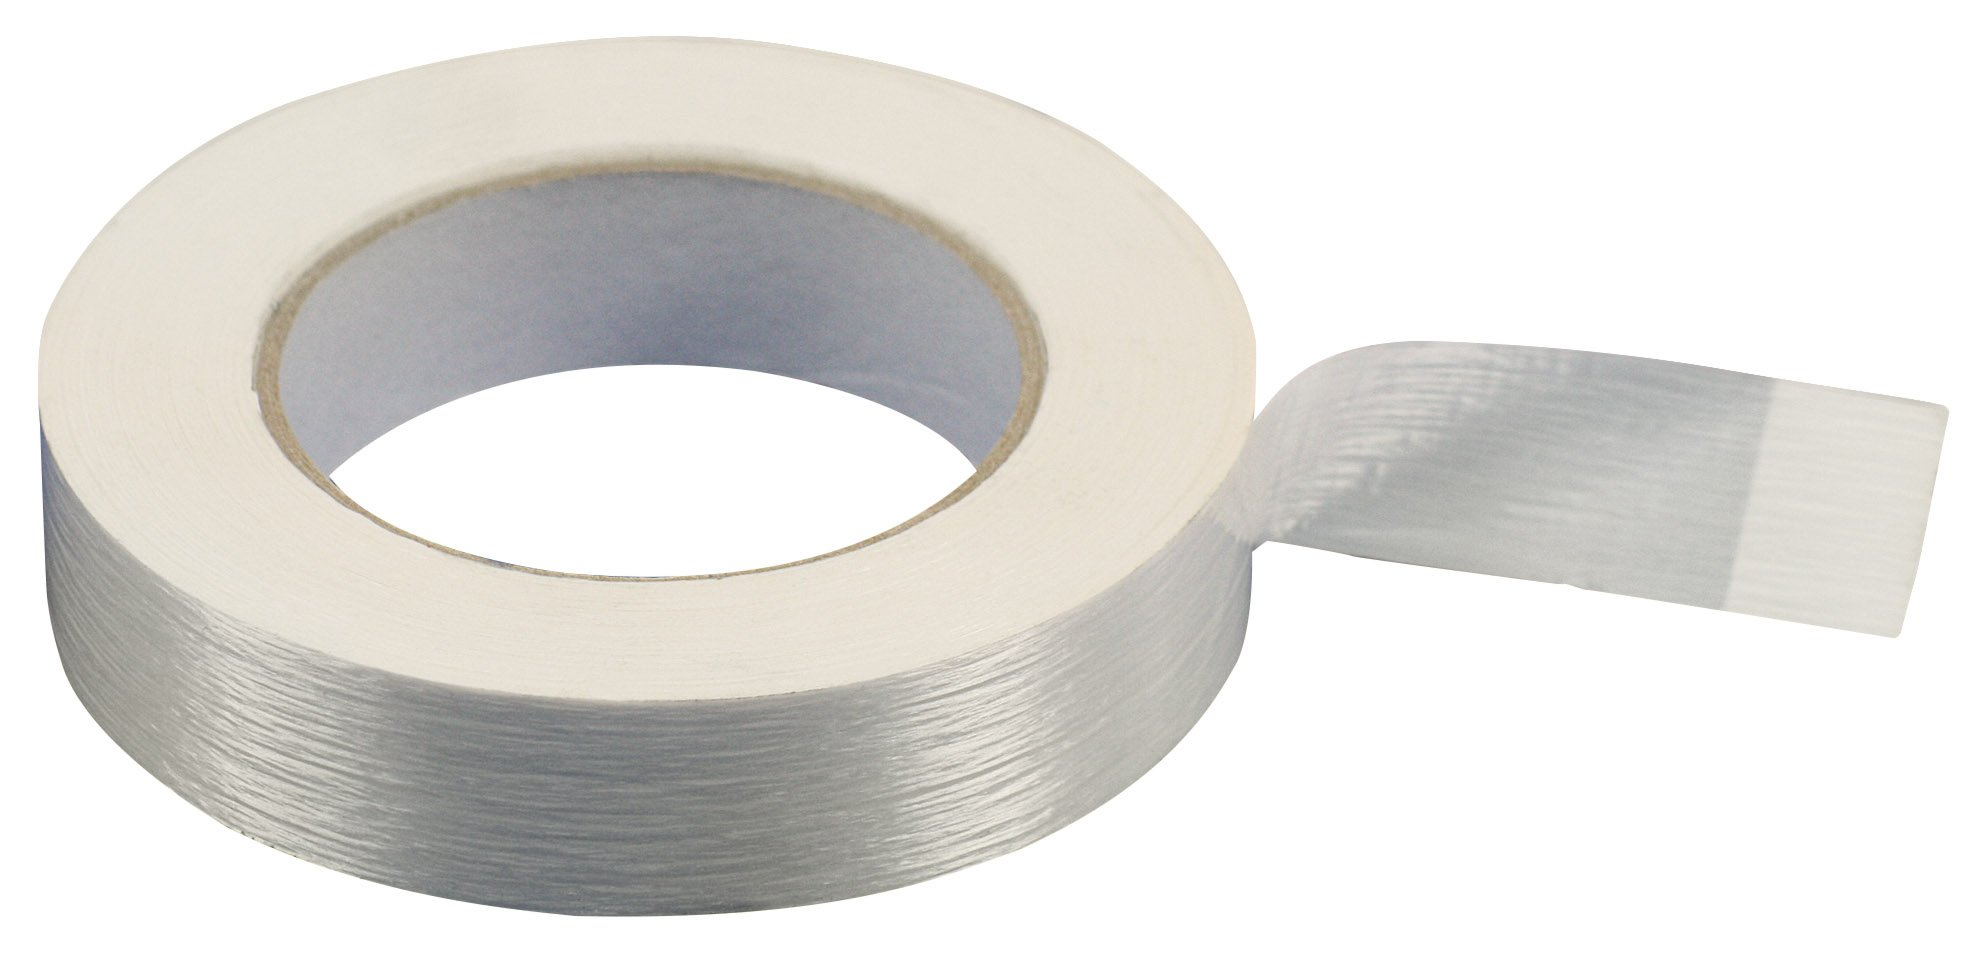 CS Unitec 49000 PTX Special Adhesive Tape, 165' Long x 1'' Wide by C.S. Unitec